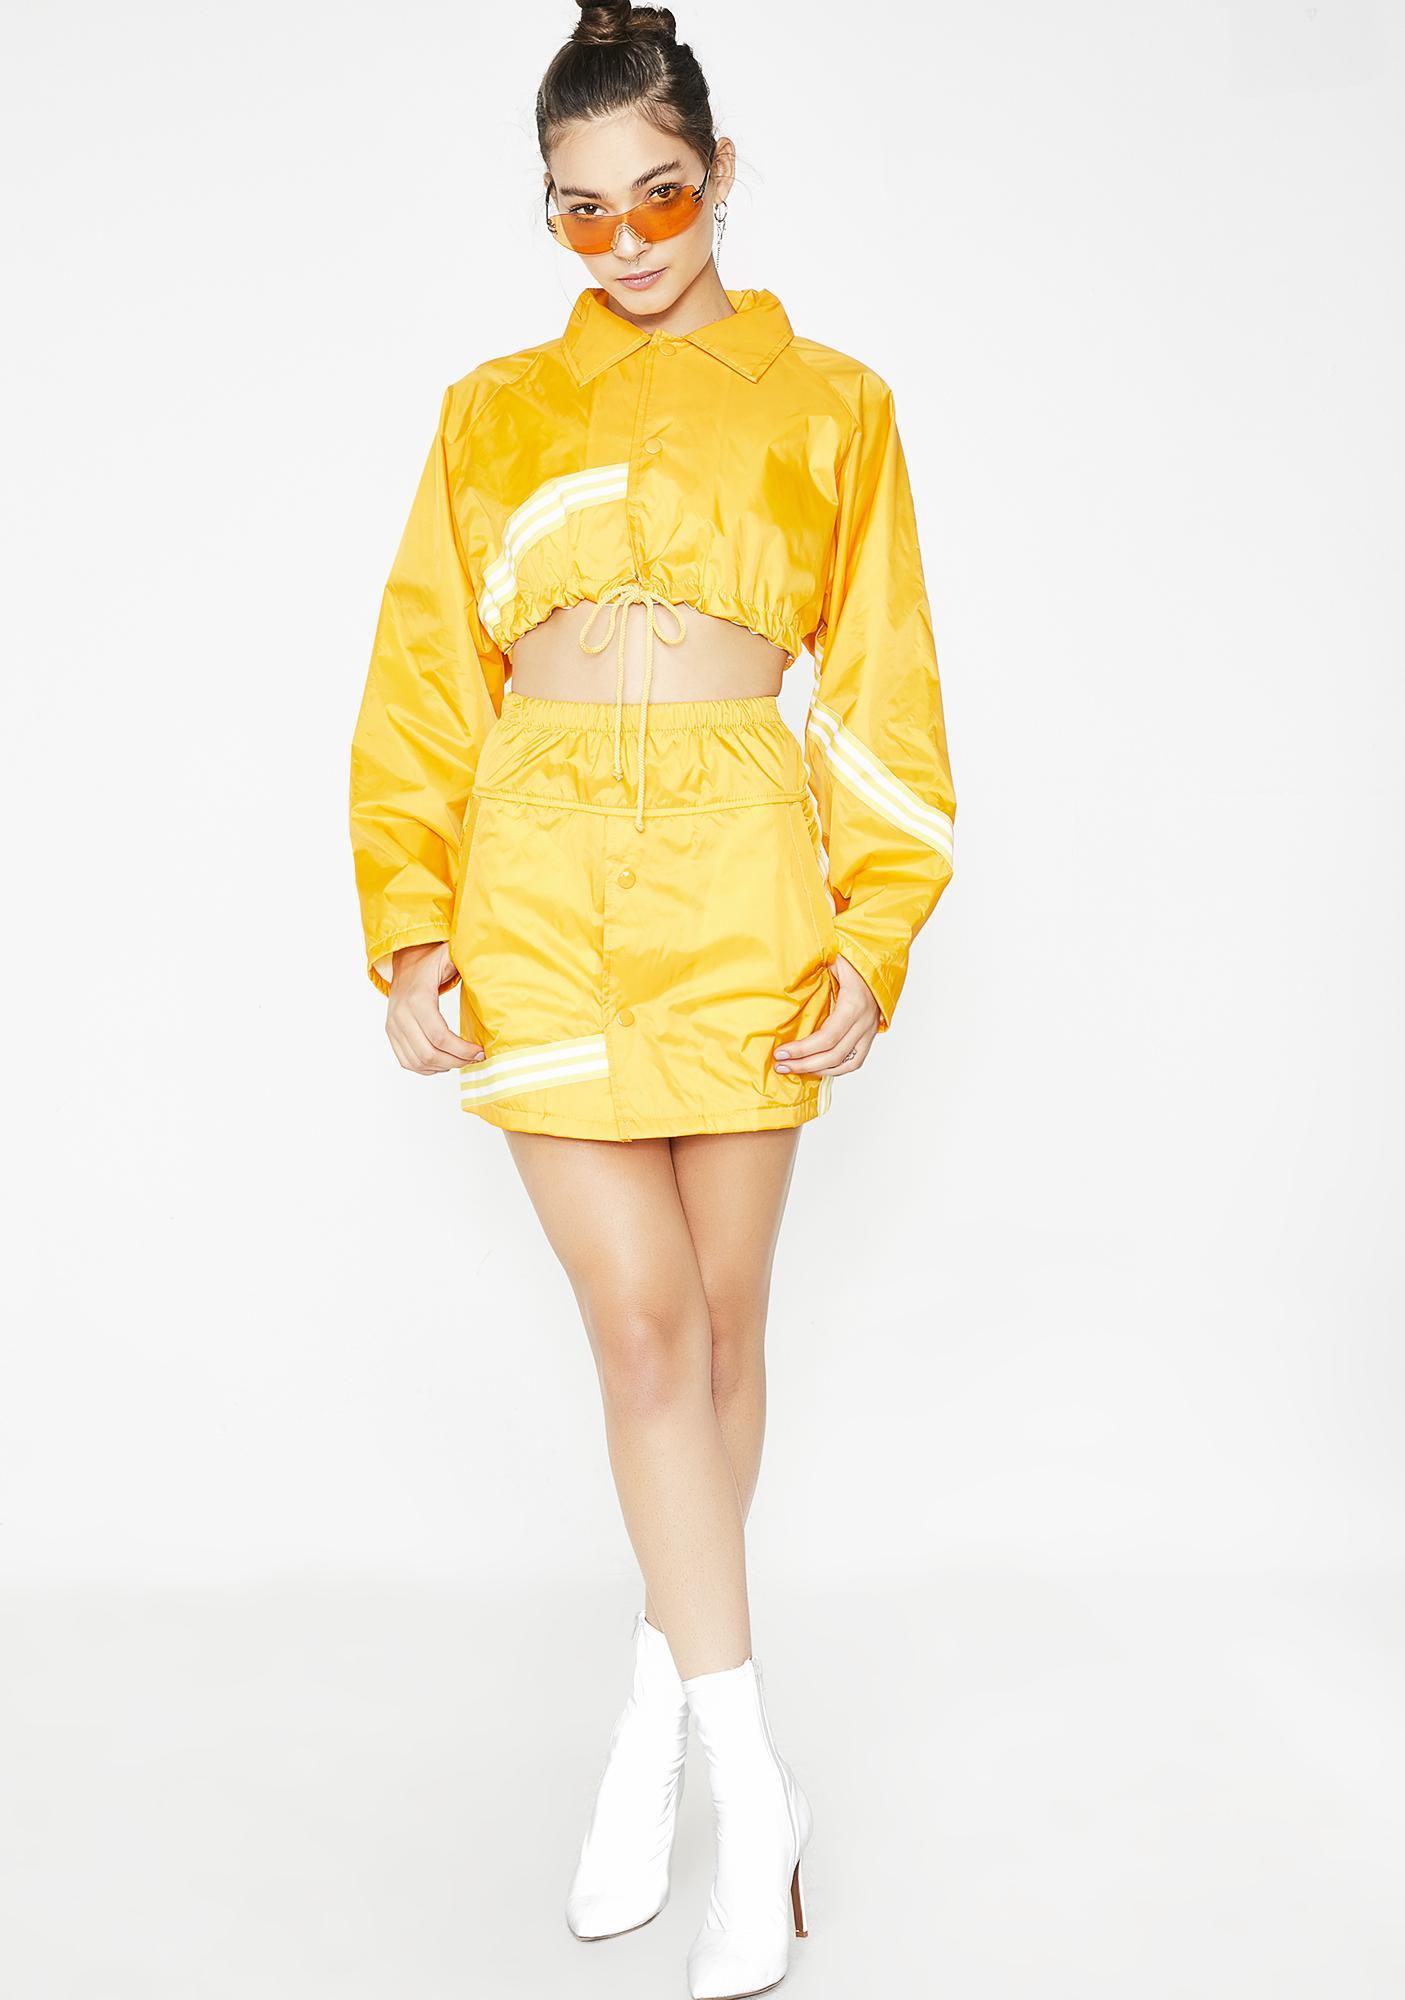 Rojas Chaotic Mini Skirt